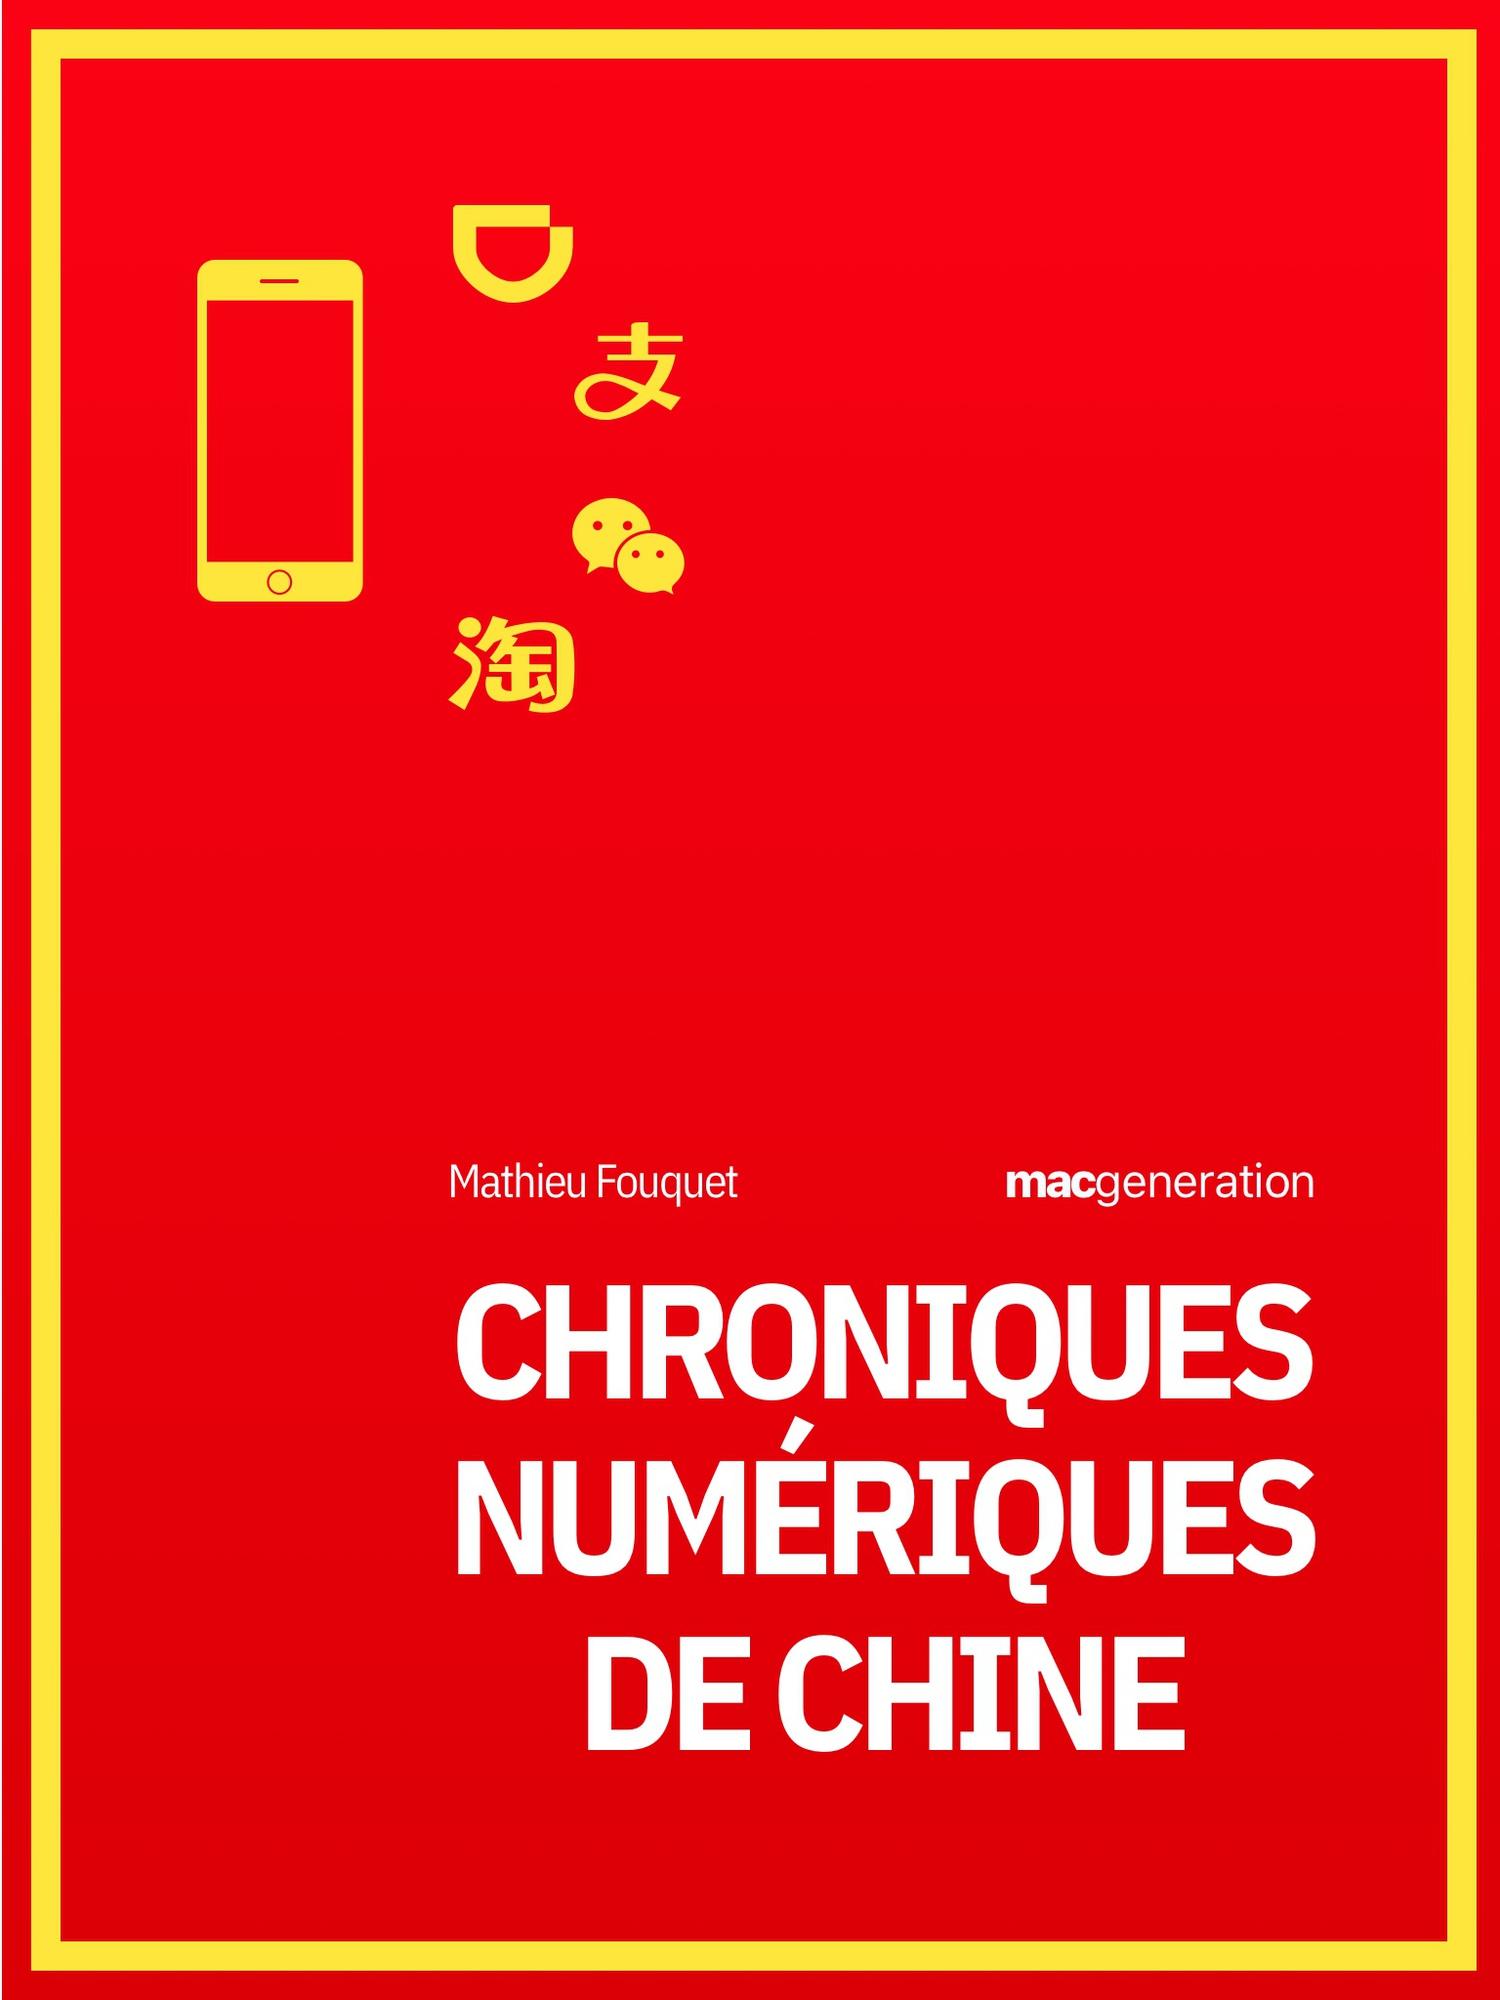 livres/hc-chine.jpg